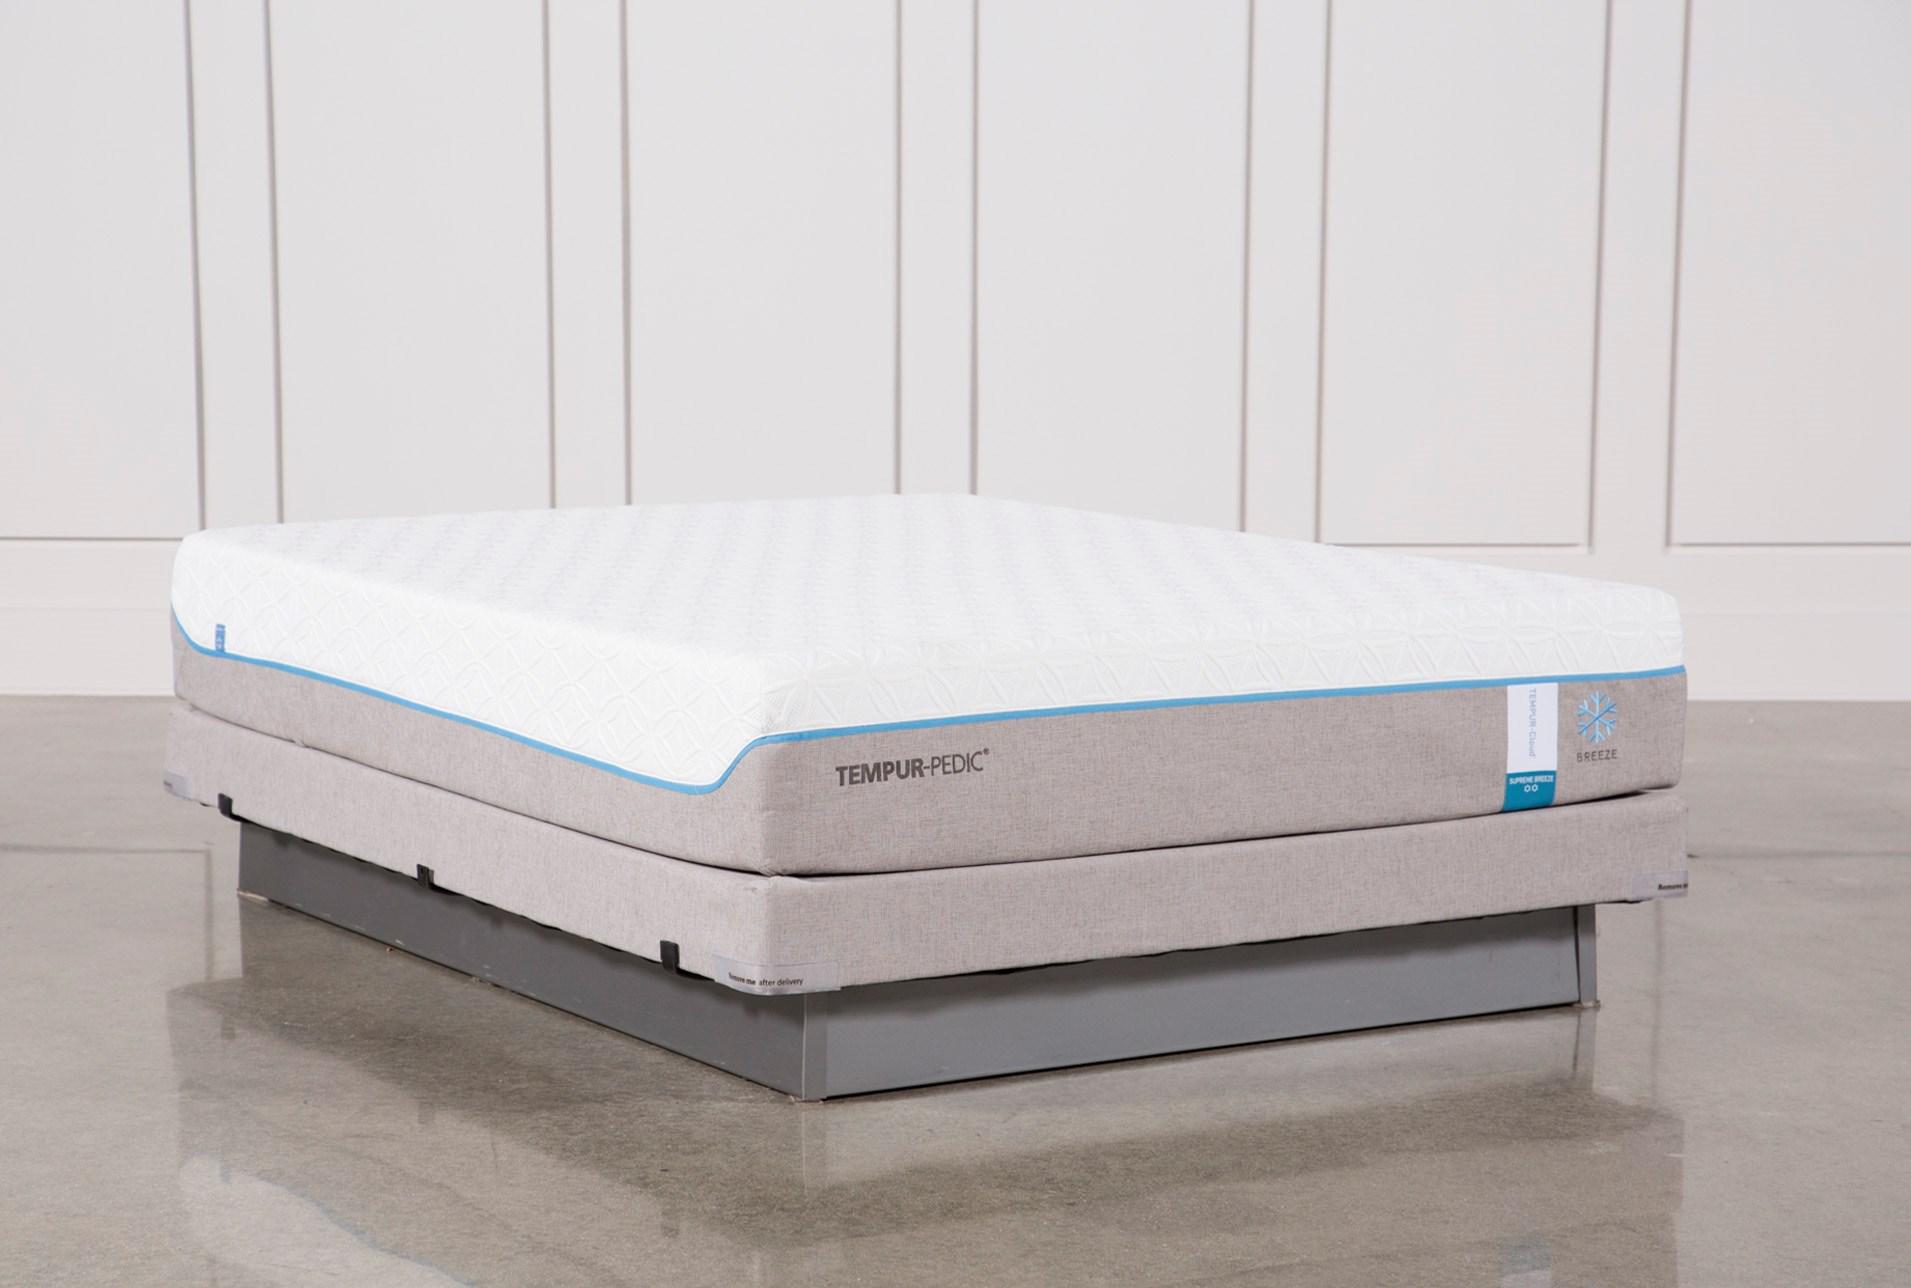 tempur pedic cloud supreme tempurpedic cloud supreme breeze 20 queen mattress wlow foundation 360